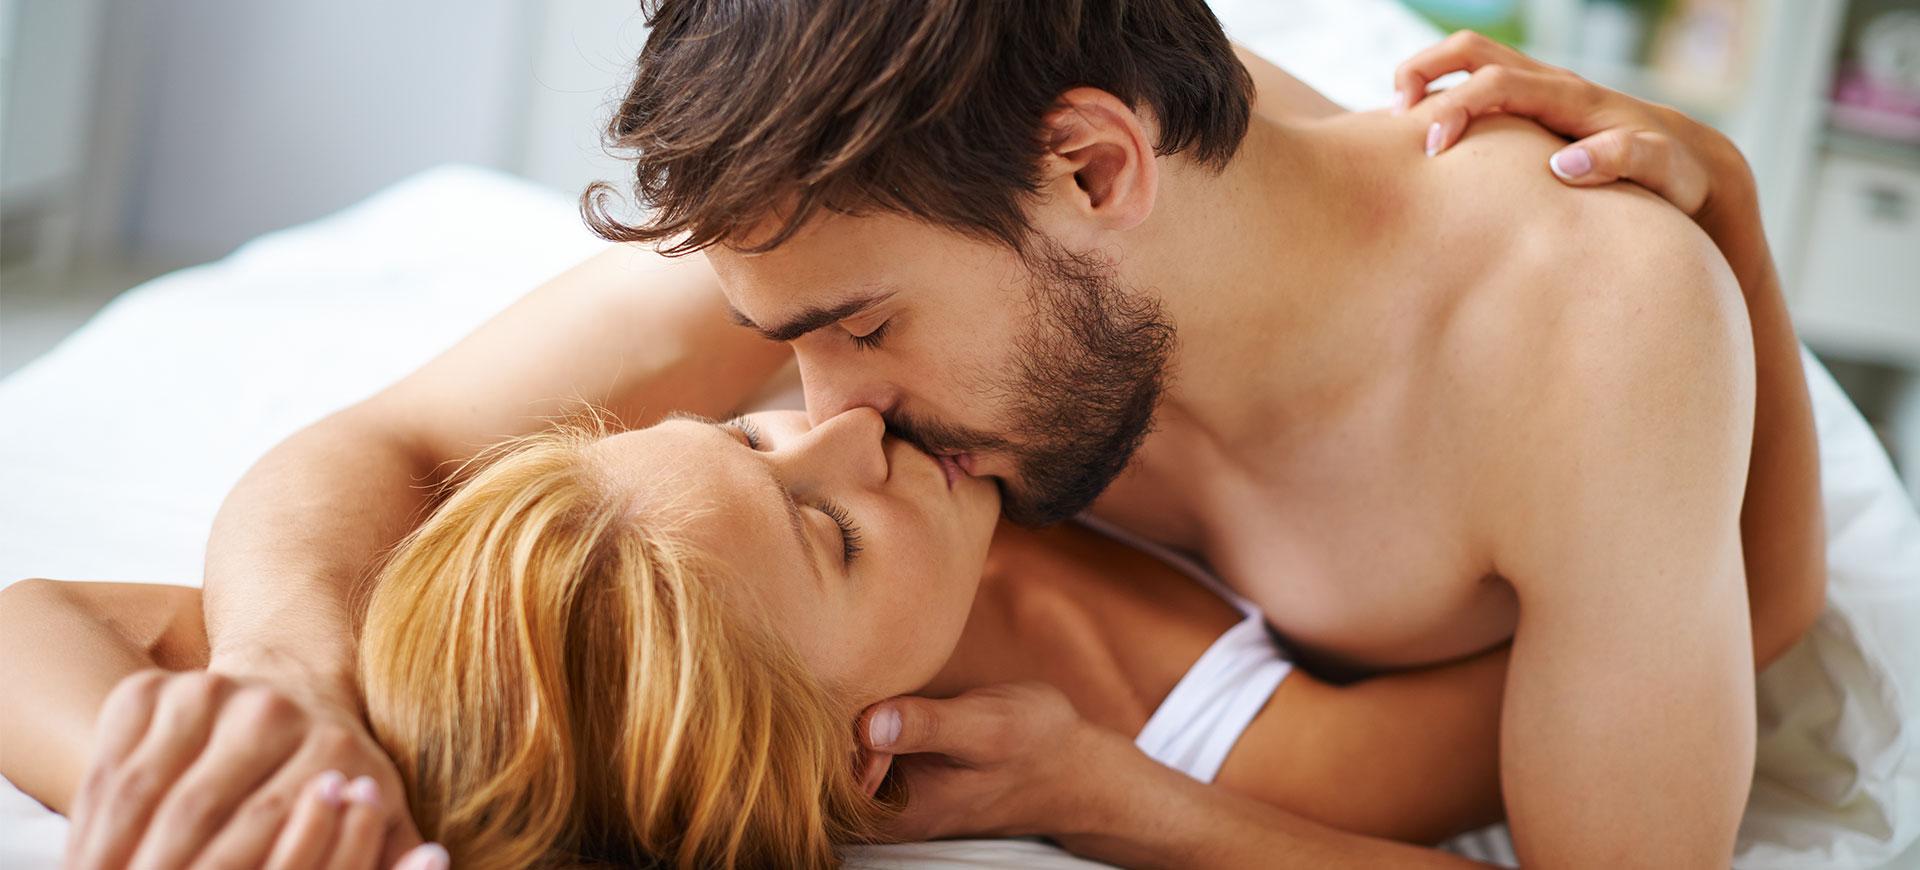 Penetrerande Sex